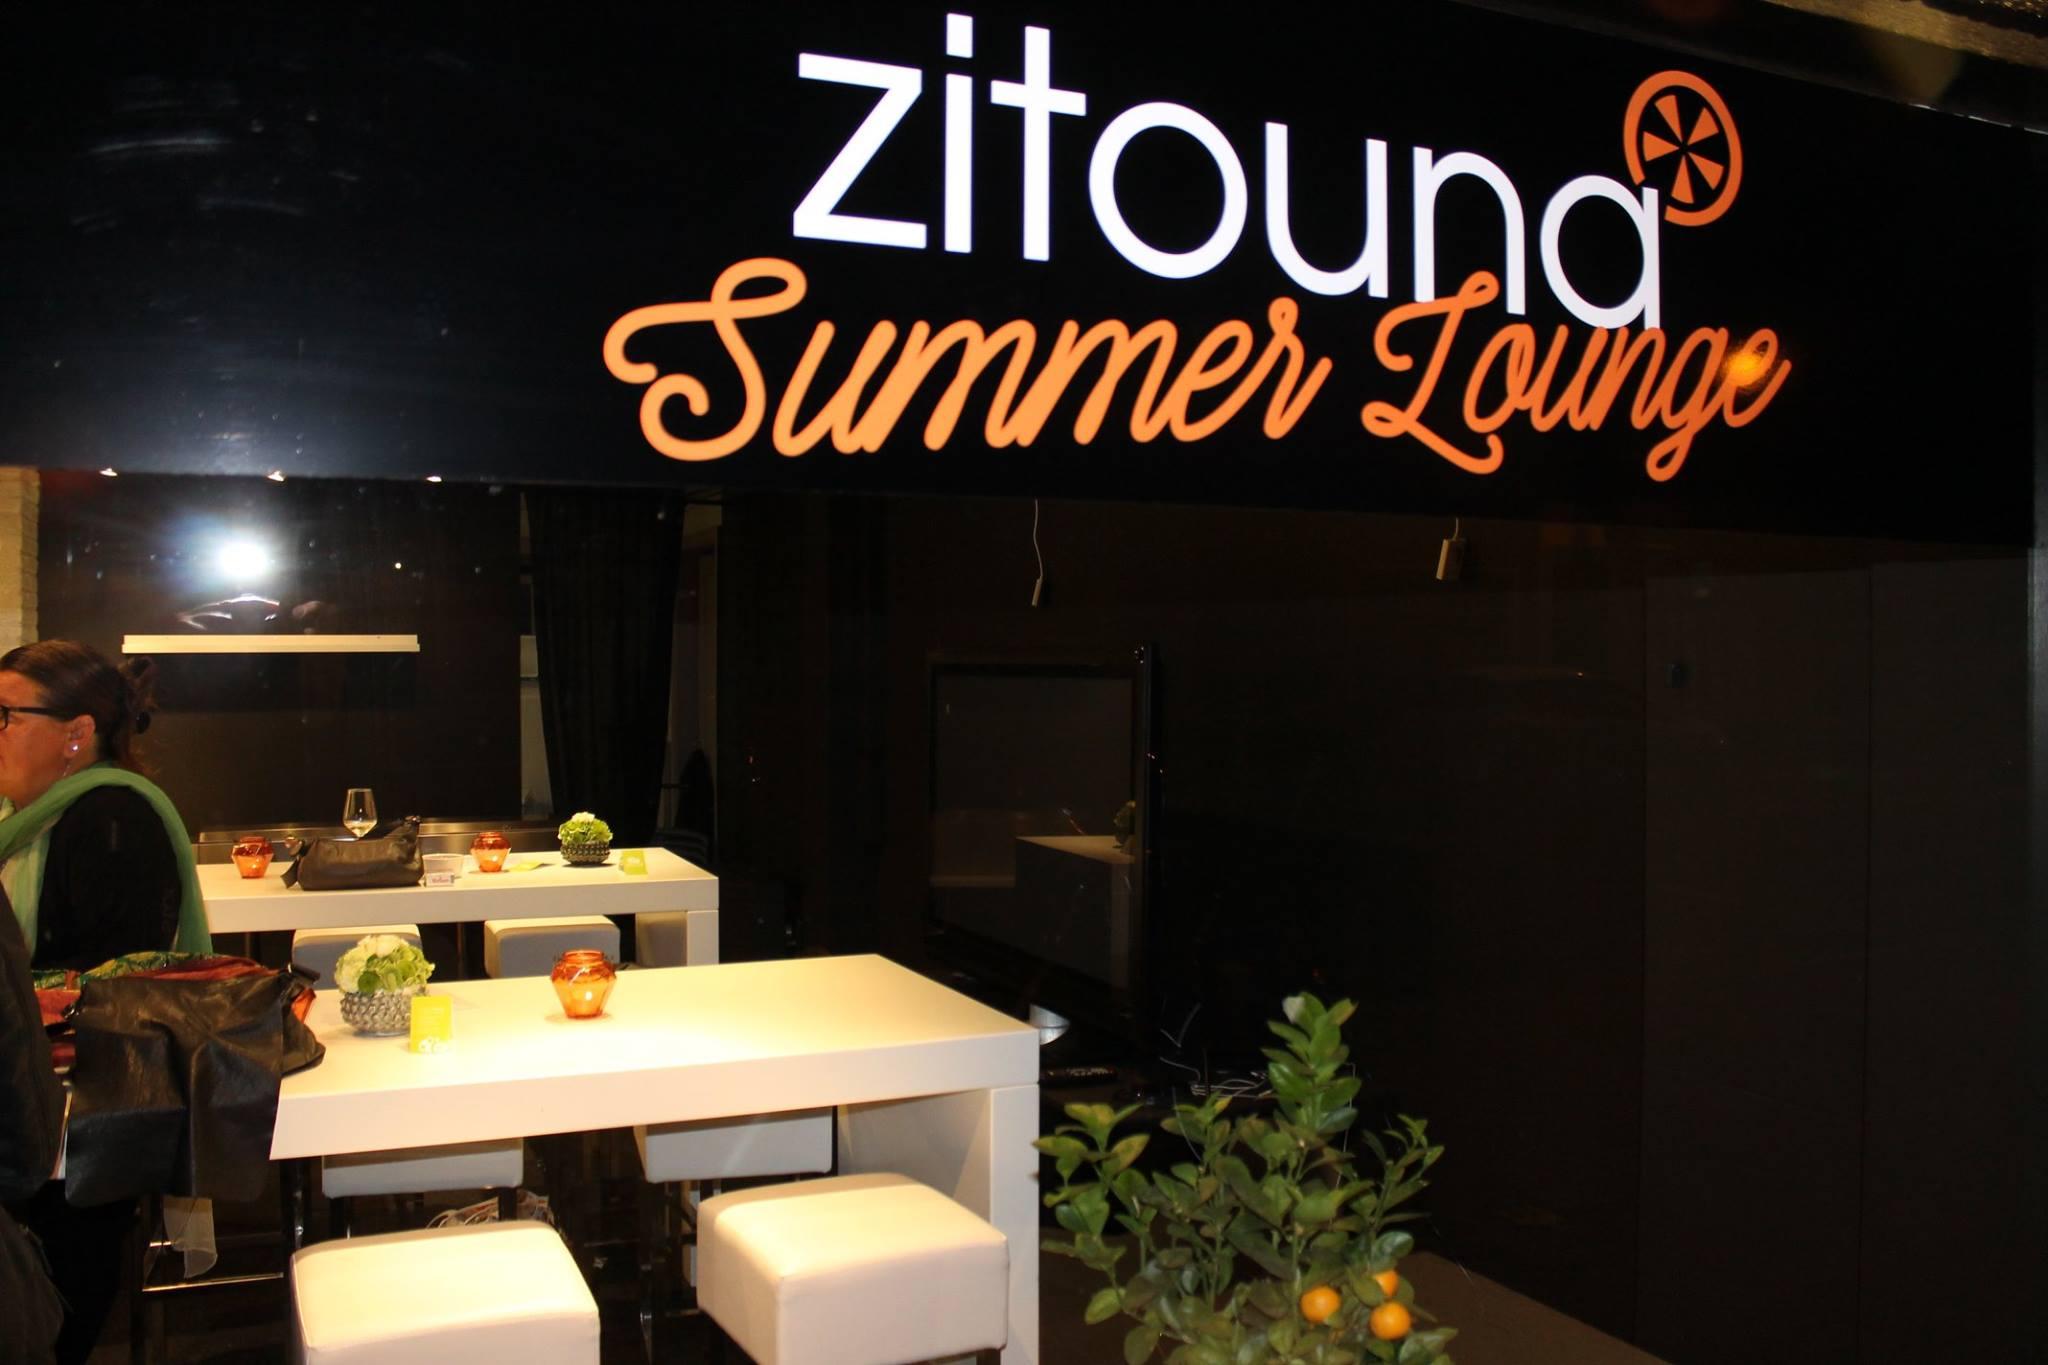 Sfeerbeeld Zitouna - Summer Lounge